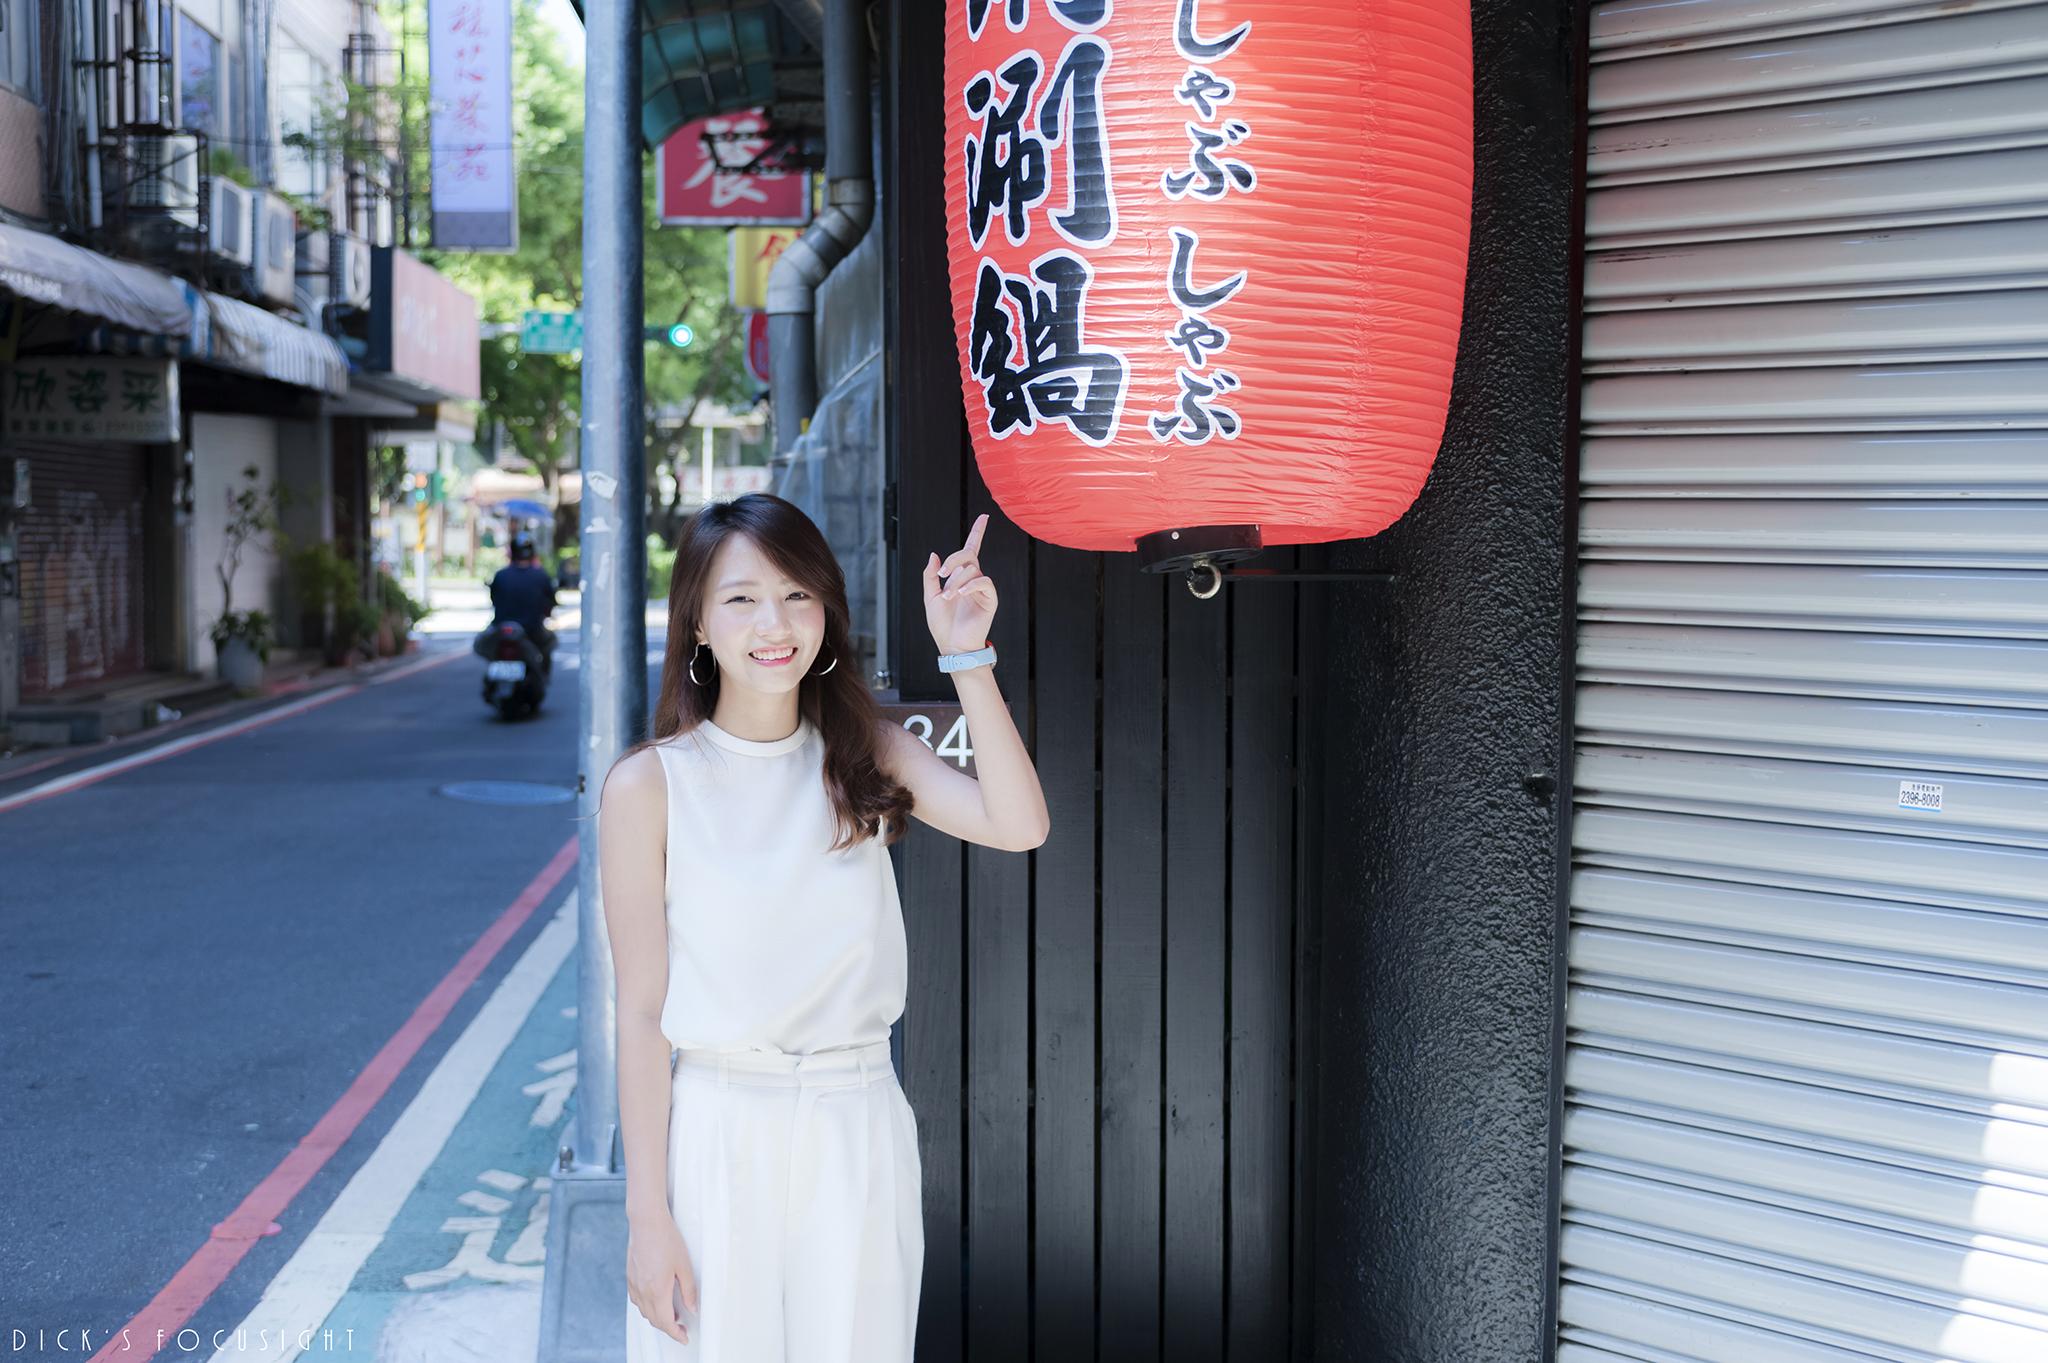 DSC 9512 - 【人像寫真】清新夏日